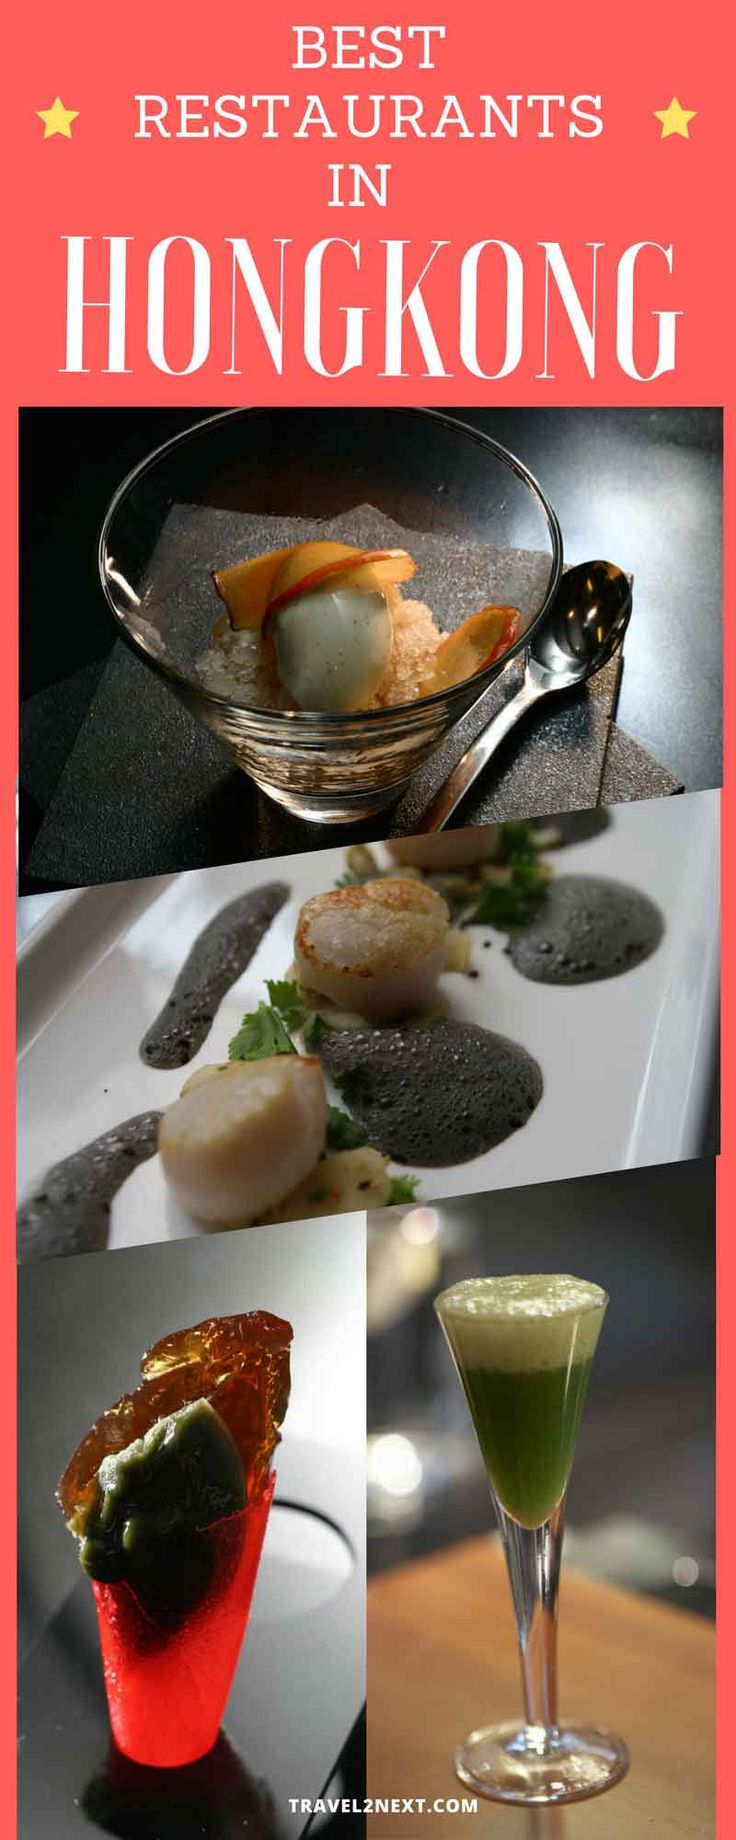 Best Restaurants in Hong Kong. Hong Kong's hippest restaurants are 21st century temples of gastronomic pleasure.